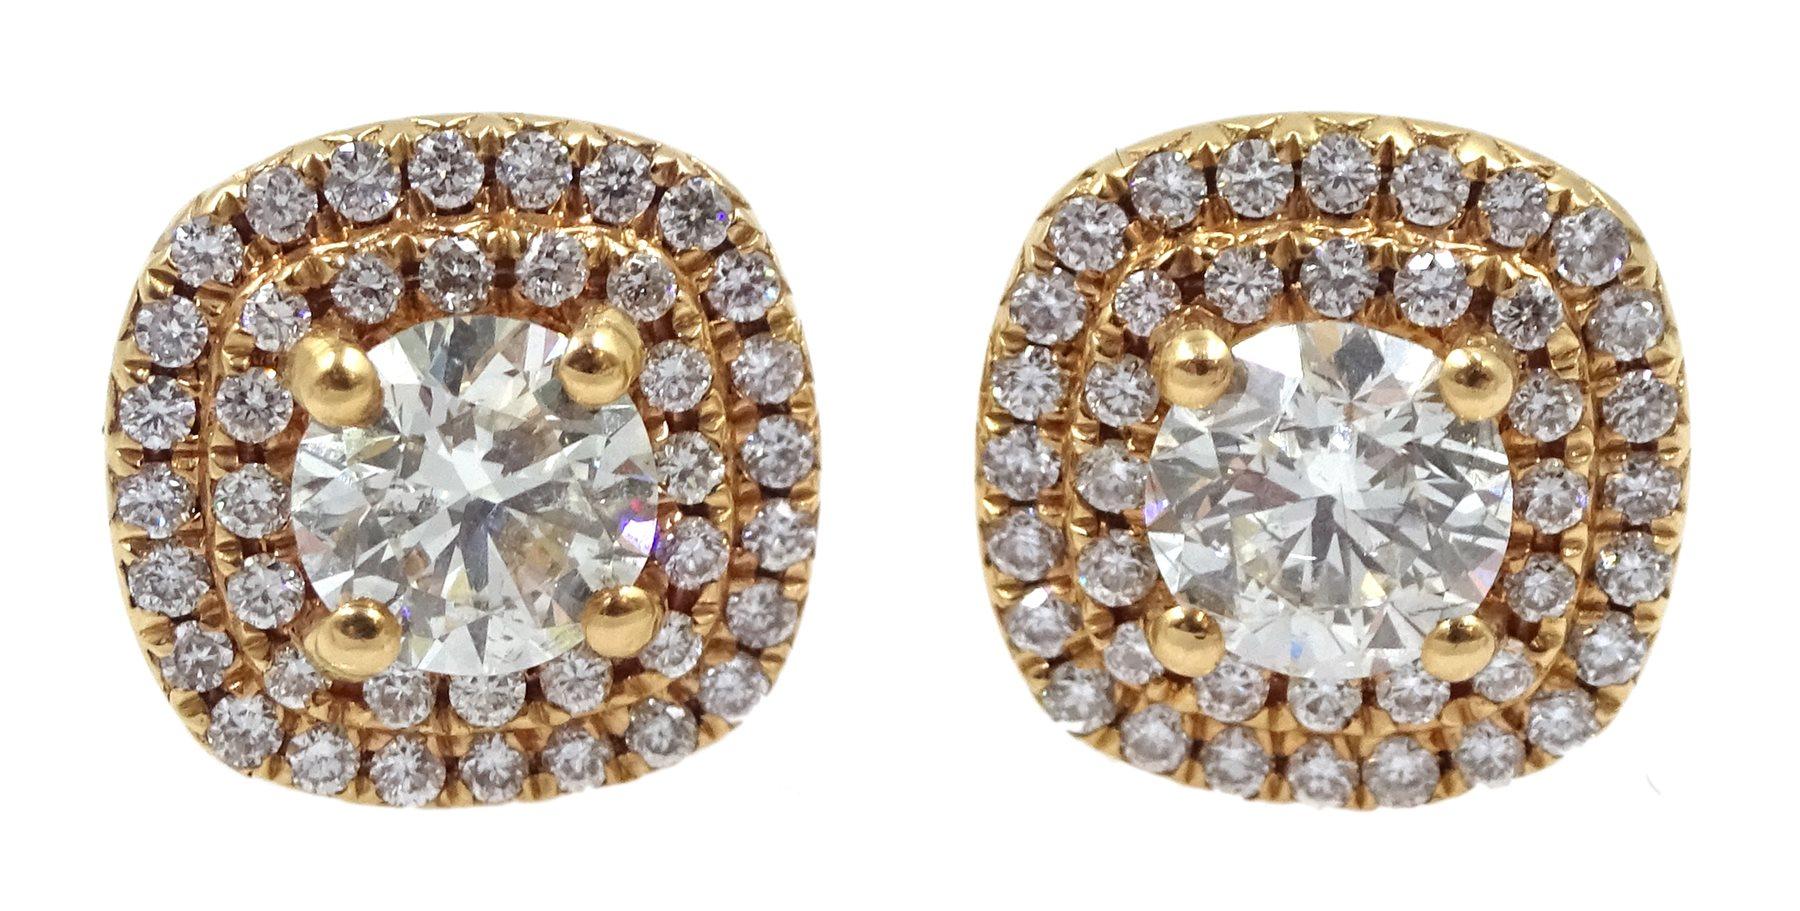 Pair of 18ct gold diamond cluster stud earrings